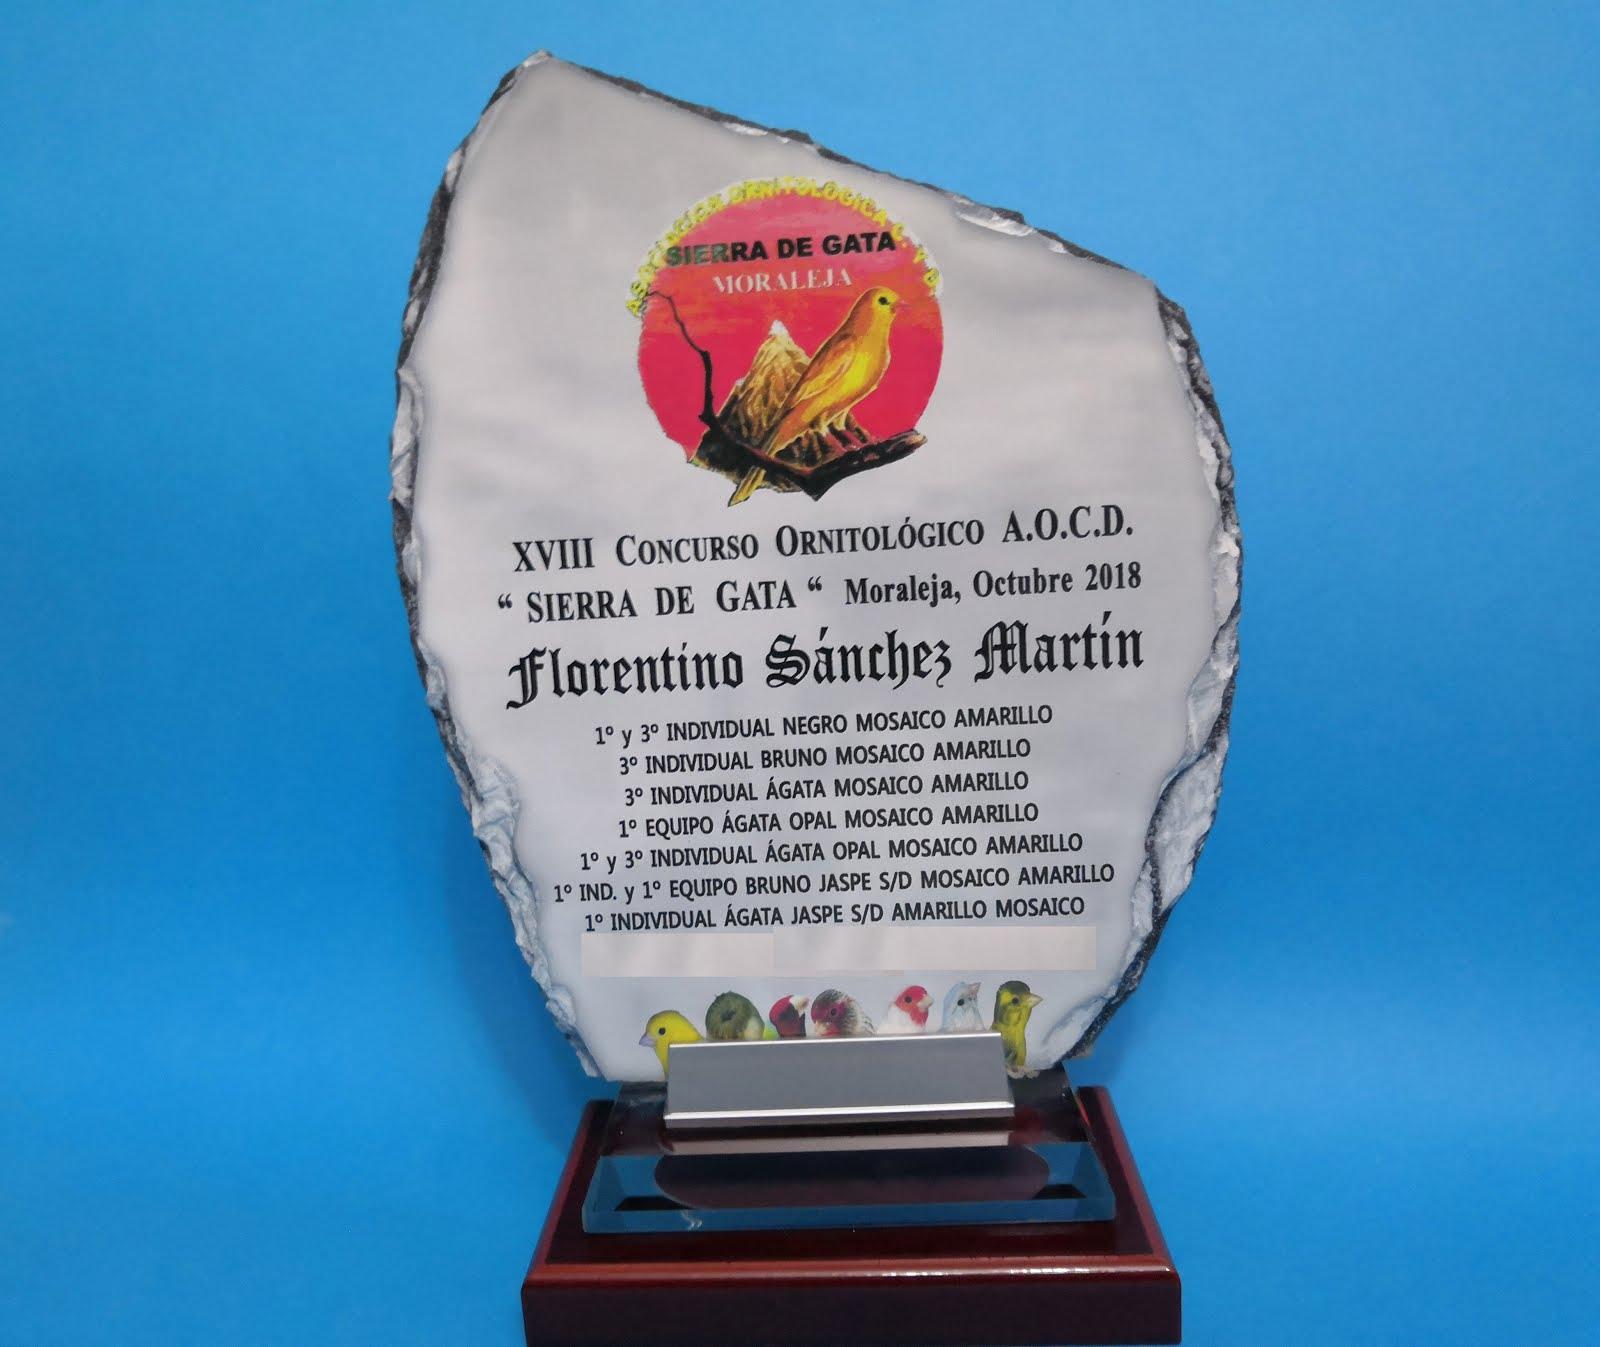 XVIII Concurso Ornitológico Sierra de Gata (Moraleja) 2018